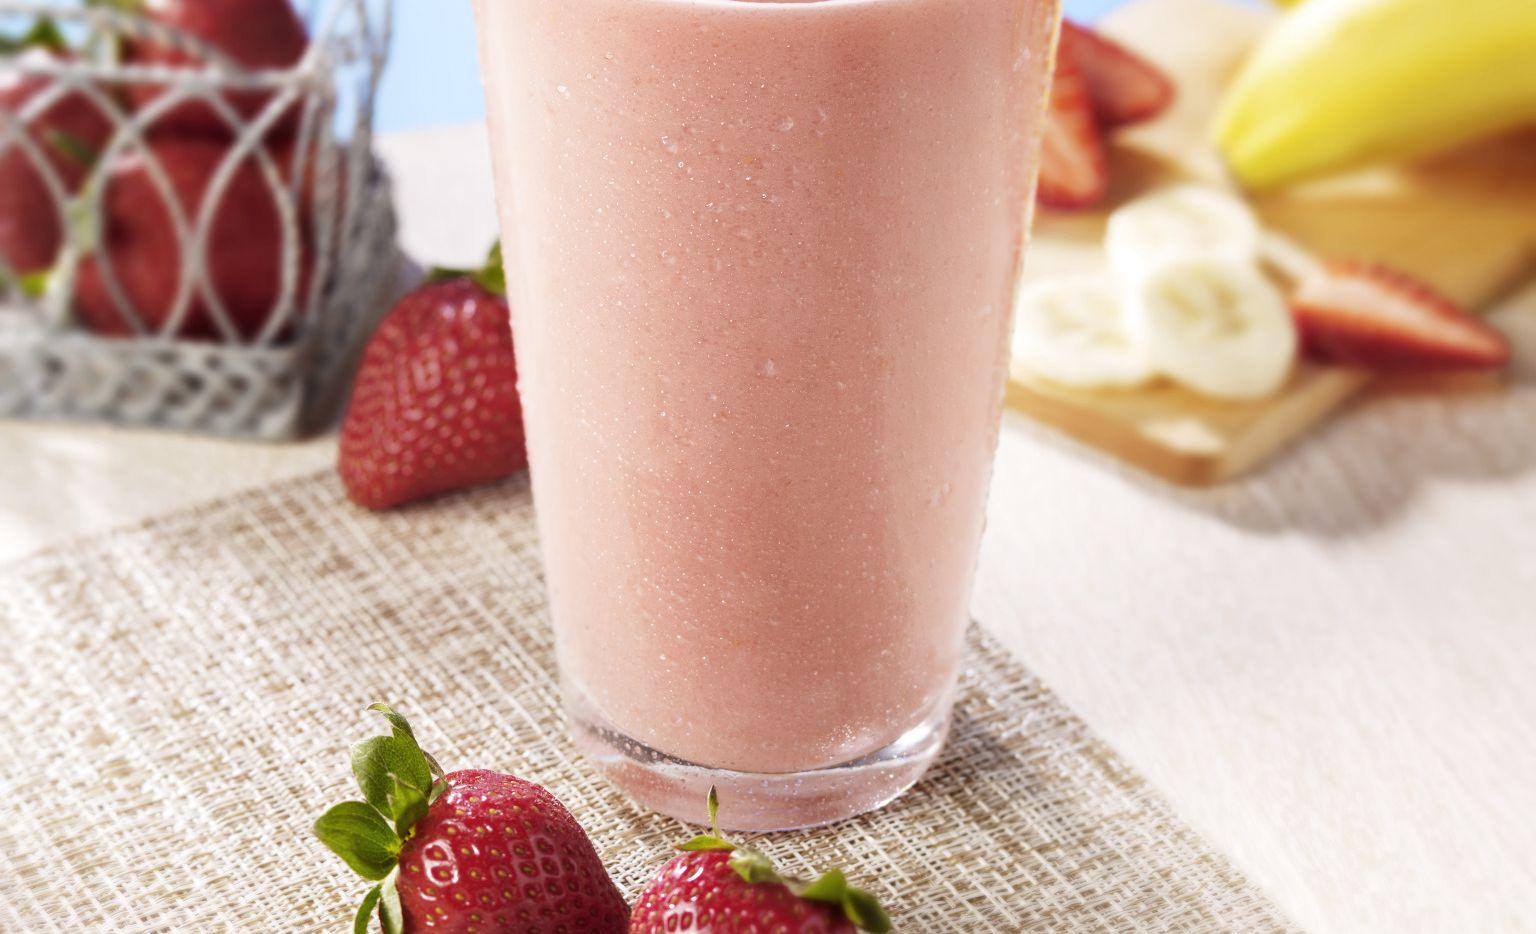 Lemon Twist Strawberry Smoothie